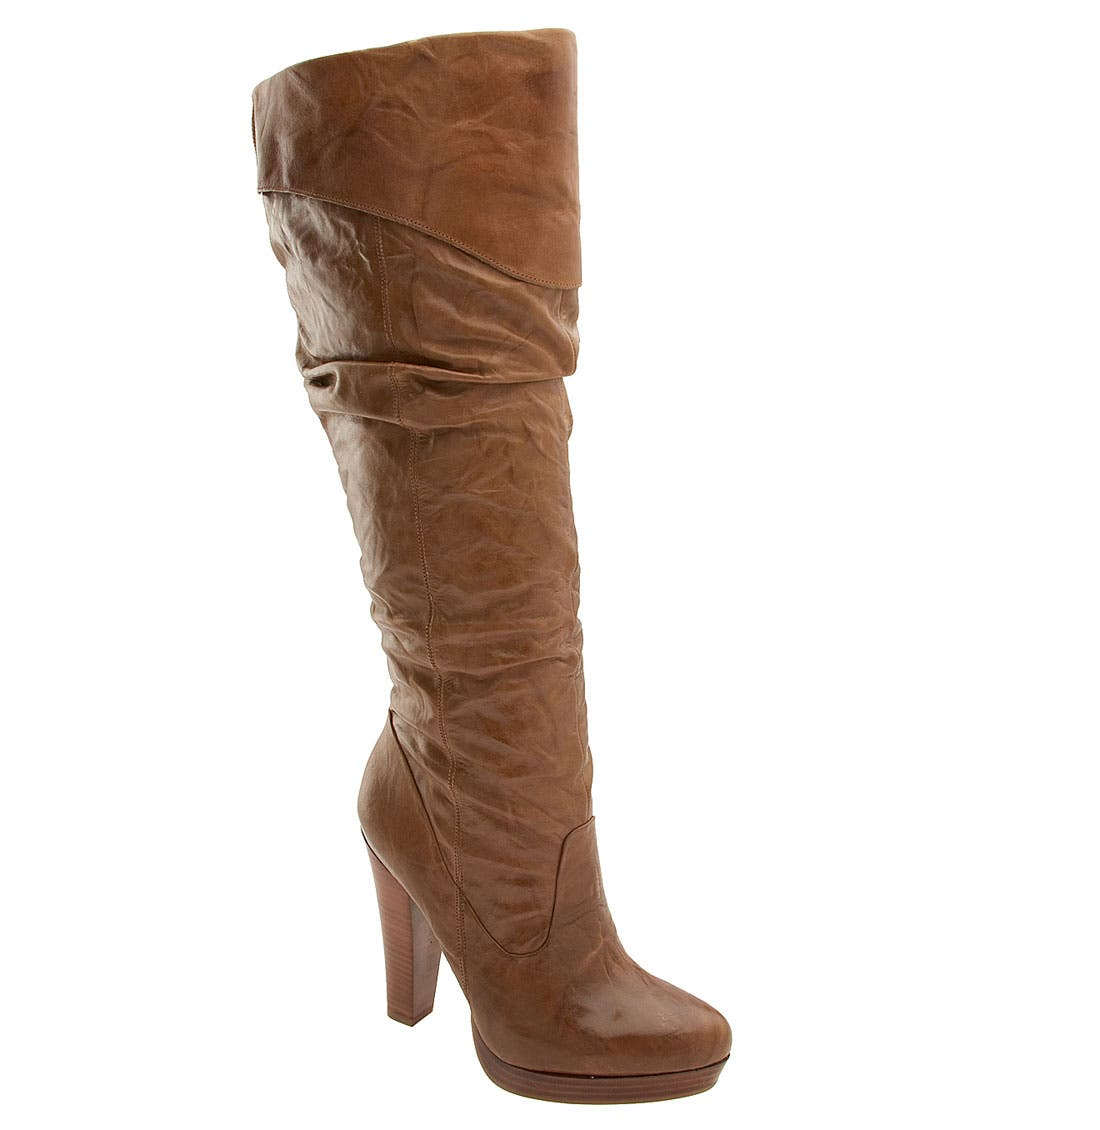 Alternate Image 1 Selected - Jessica Simpson 'Tulip' Boot